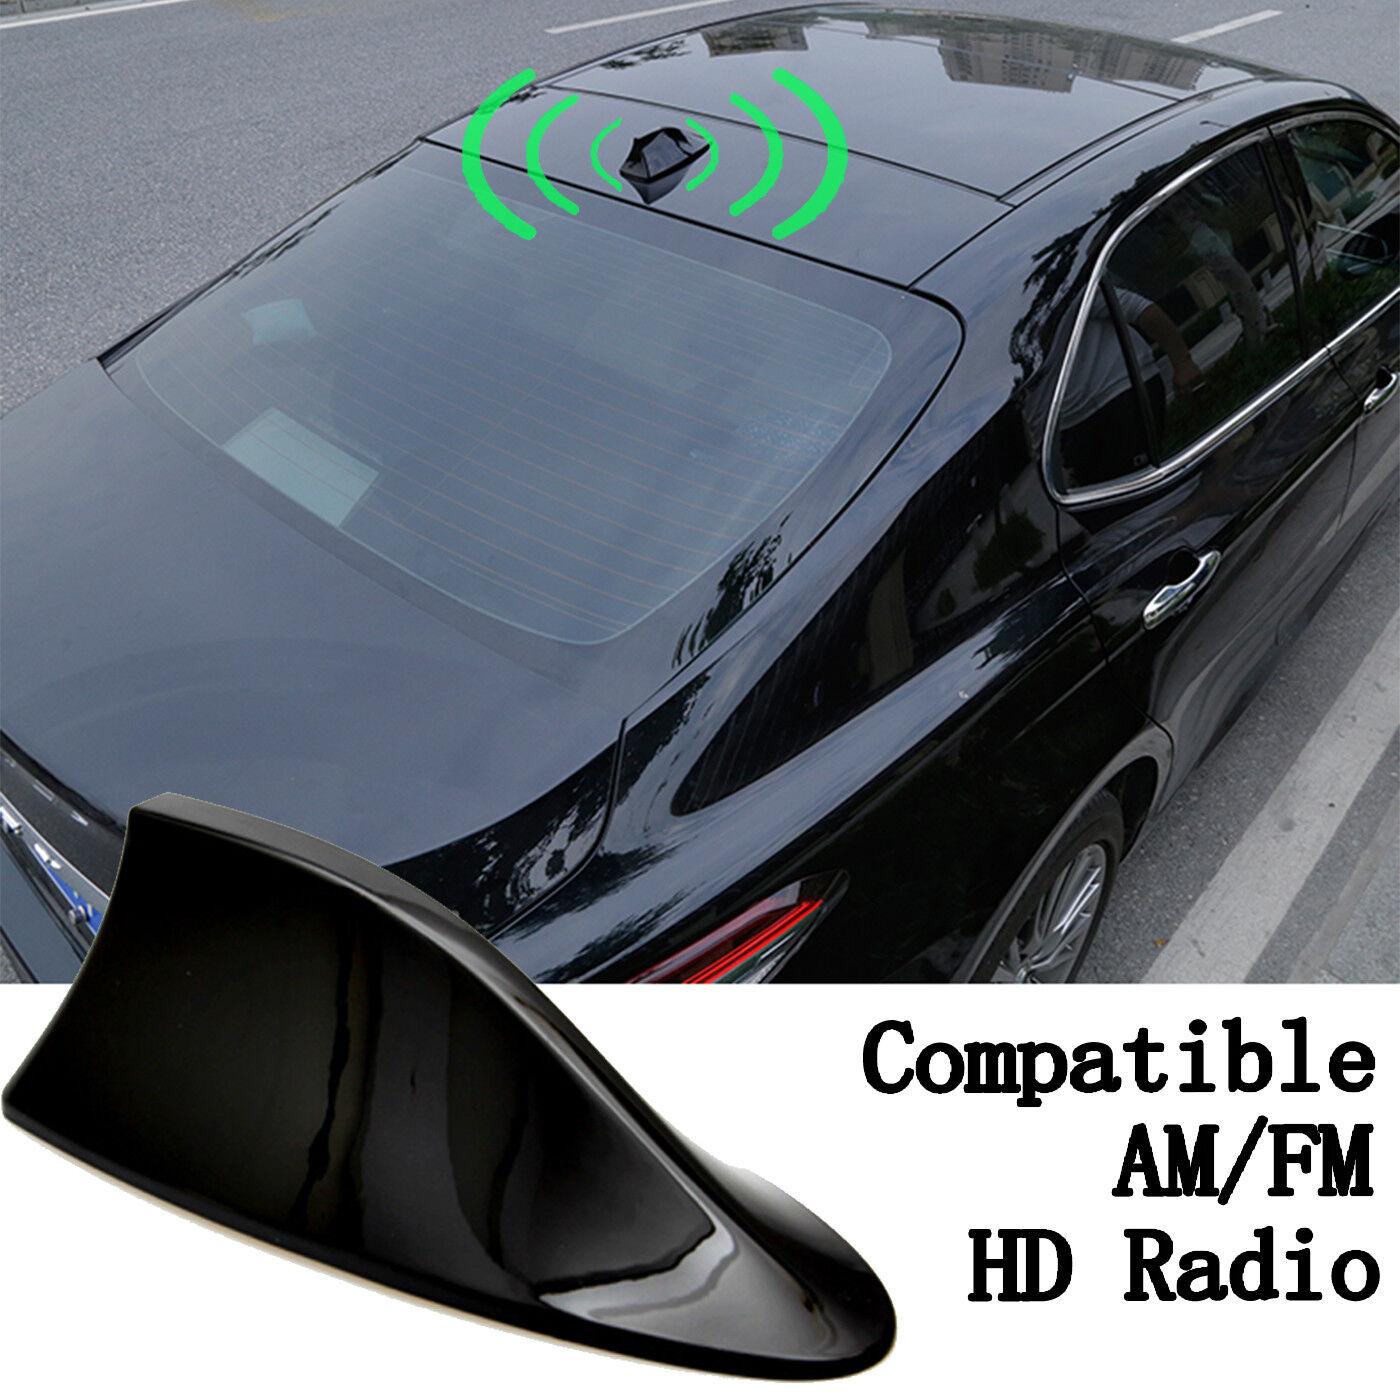 Car Shark Fins Radio AM FM Antennas Aerial with Adhesive Tabe Base Possbay Car Antenna